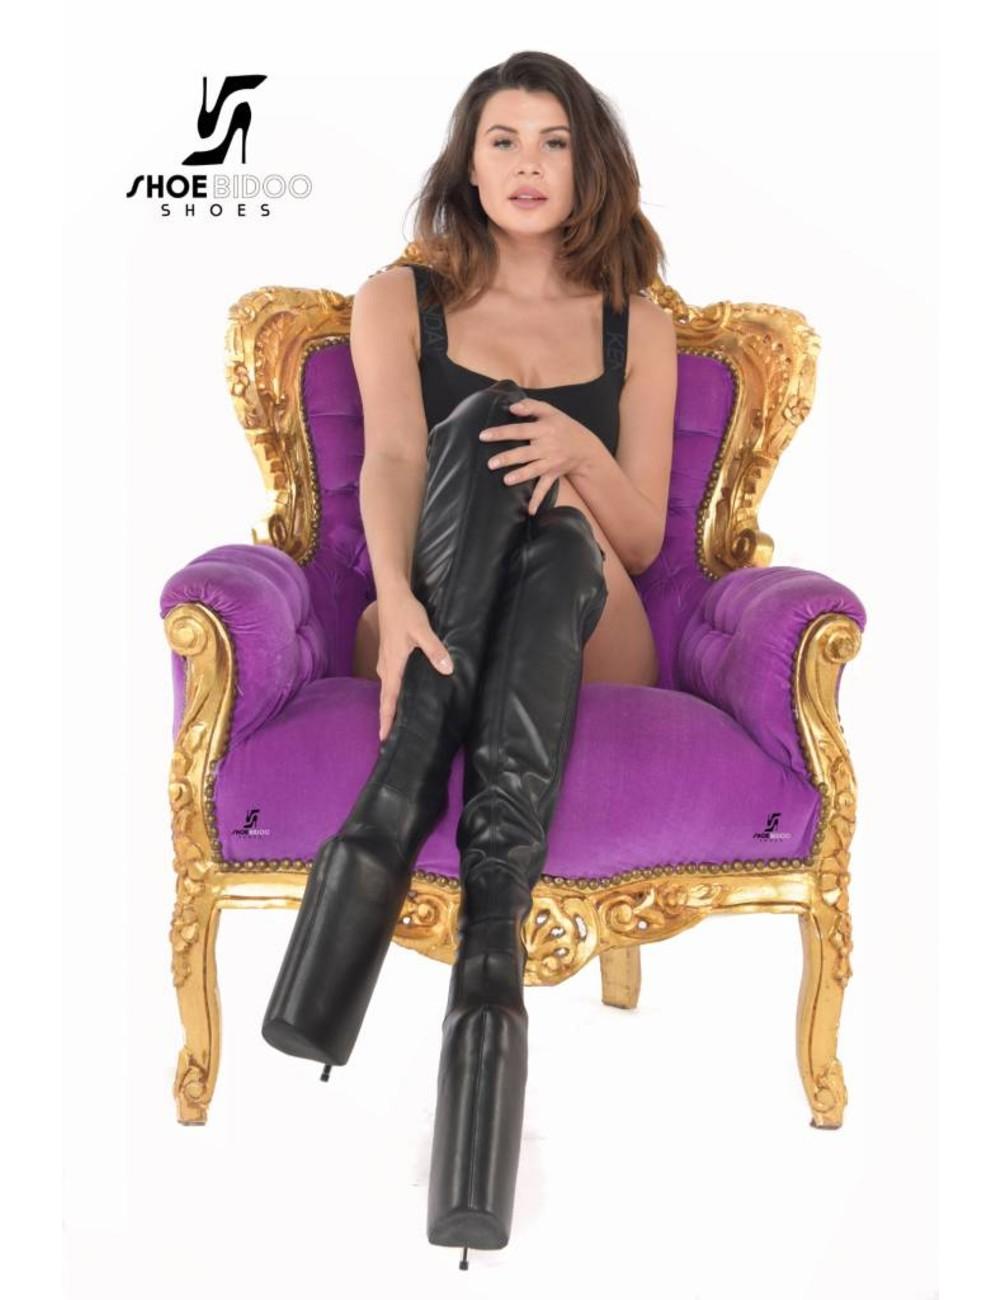 Giaro Olga trägt extreme High Heels